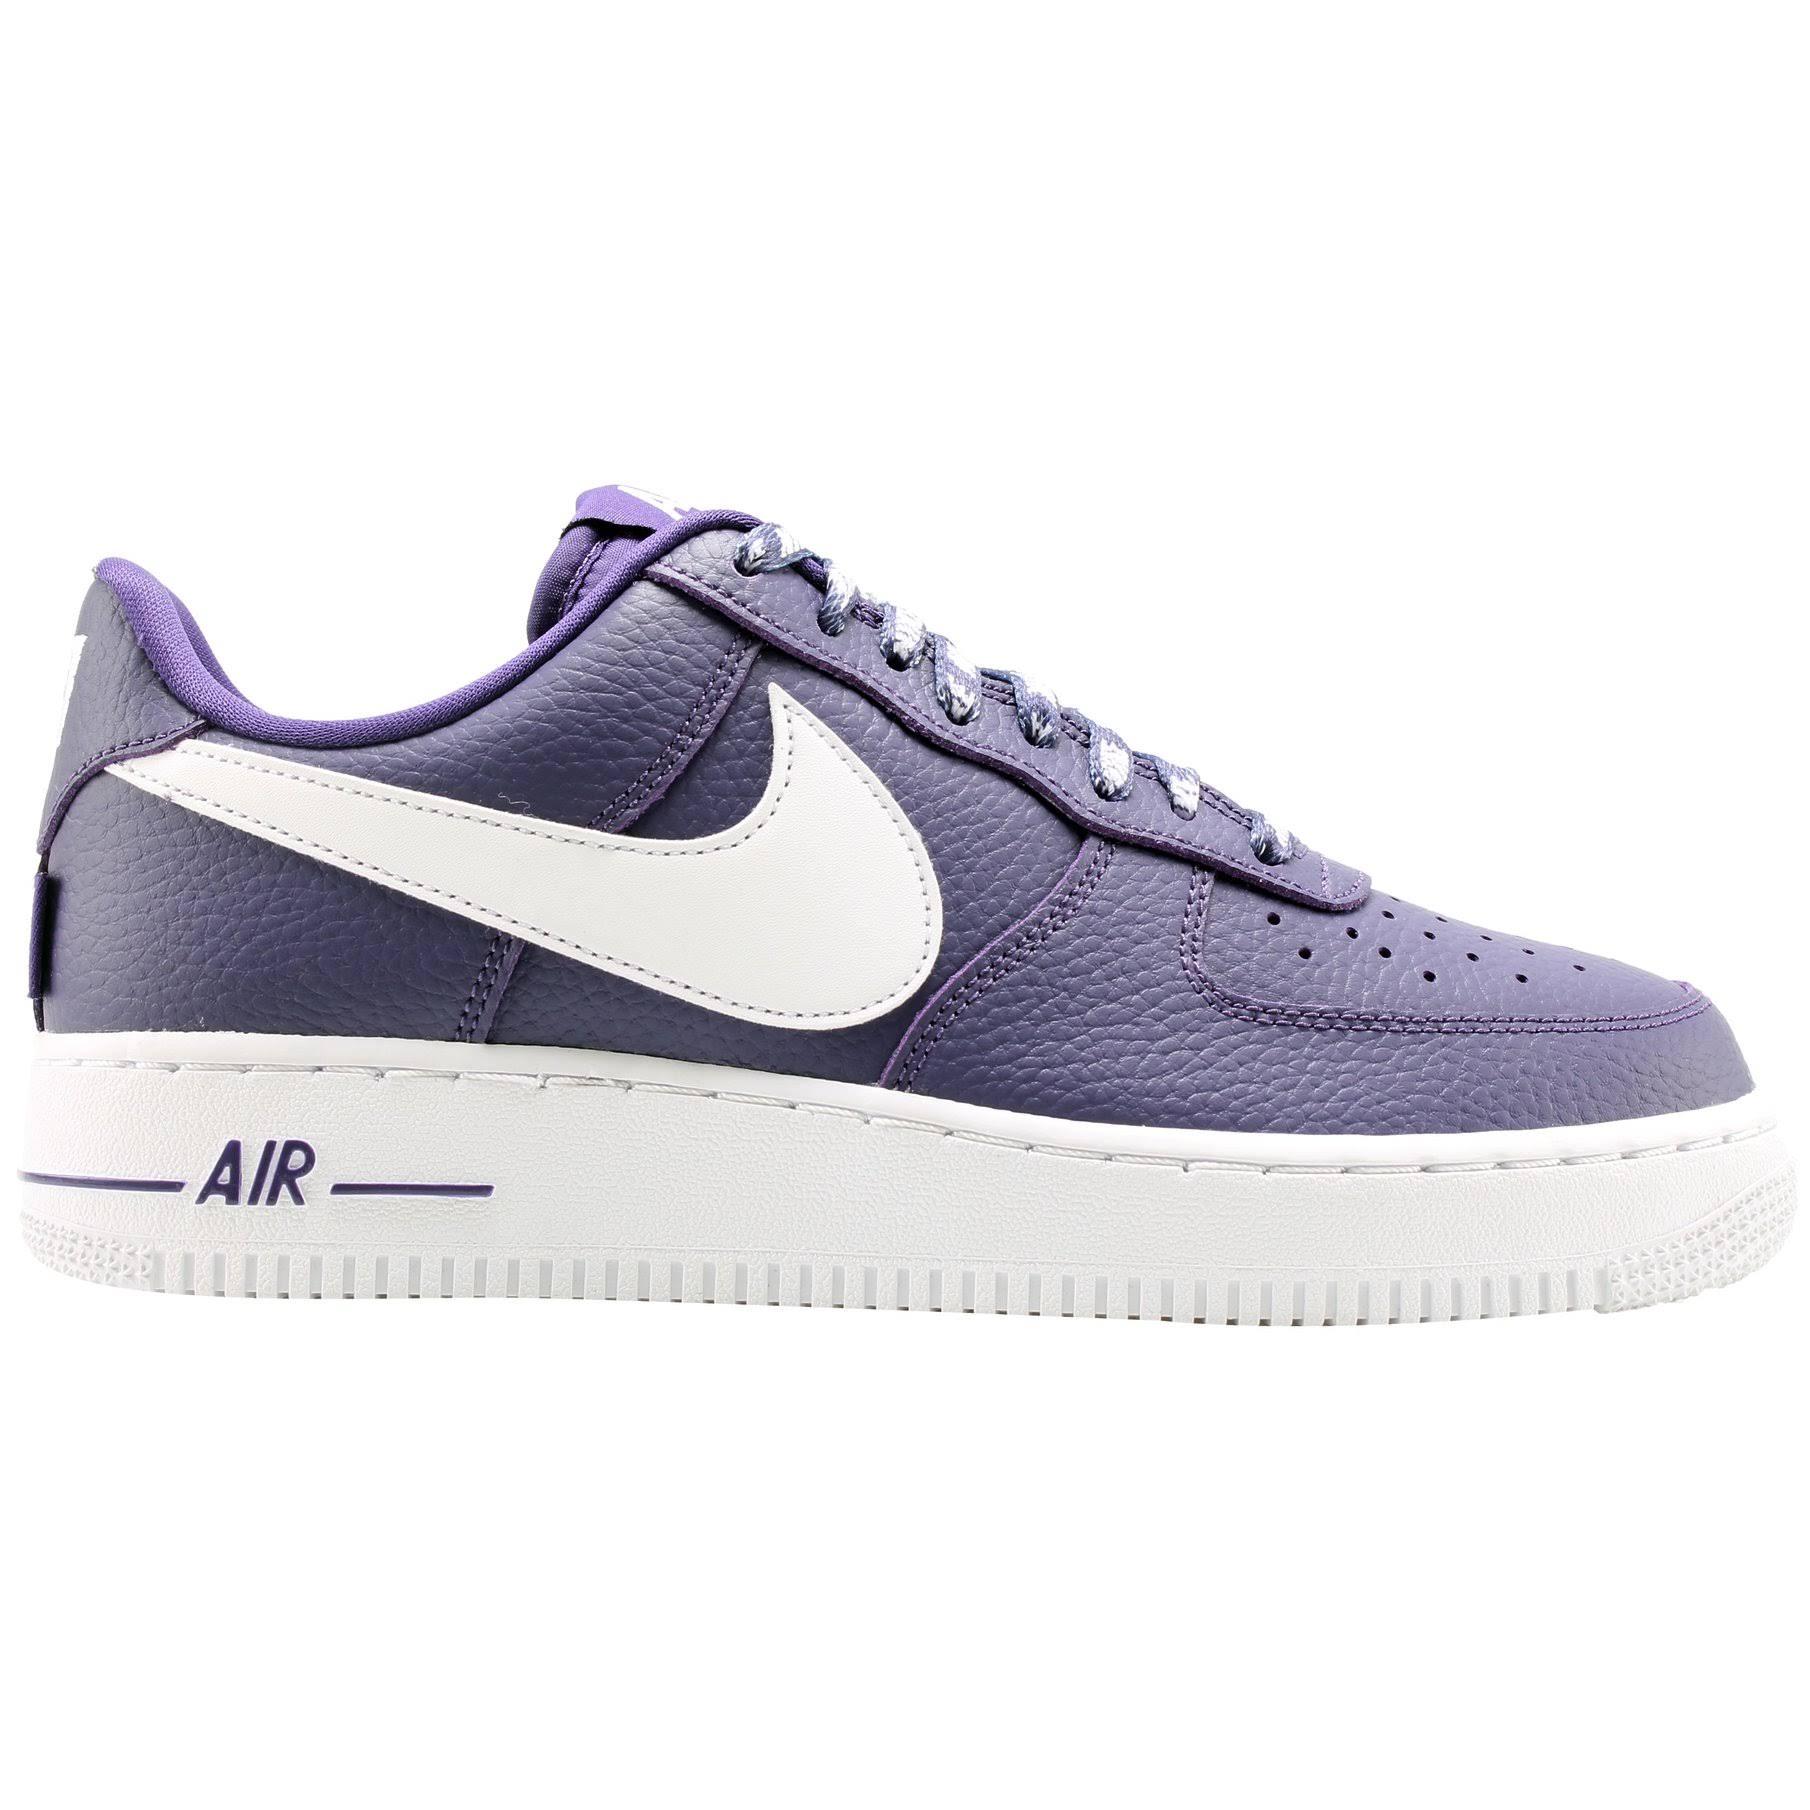 Lv8 Nike 501 Force Air 823511 1 '07 Multicolor RqzHqT